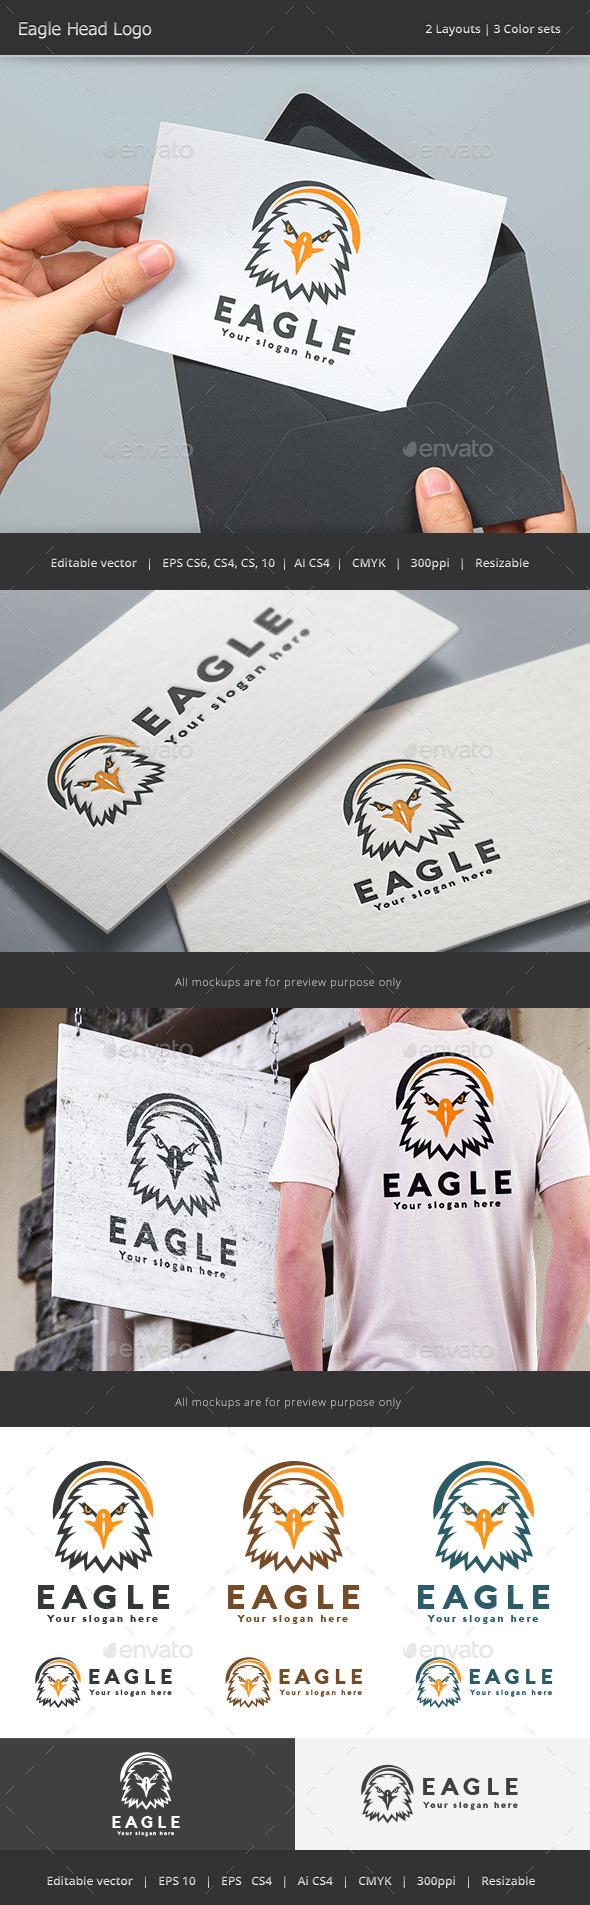 Eagle Head Logo